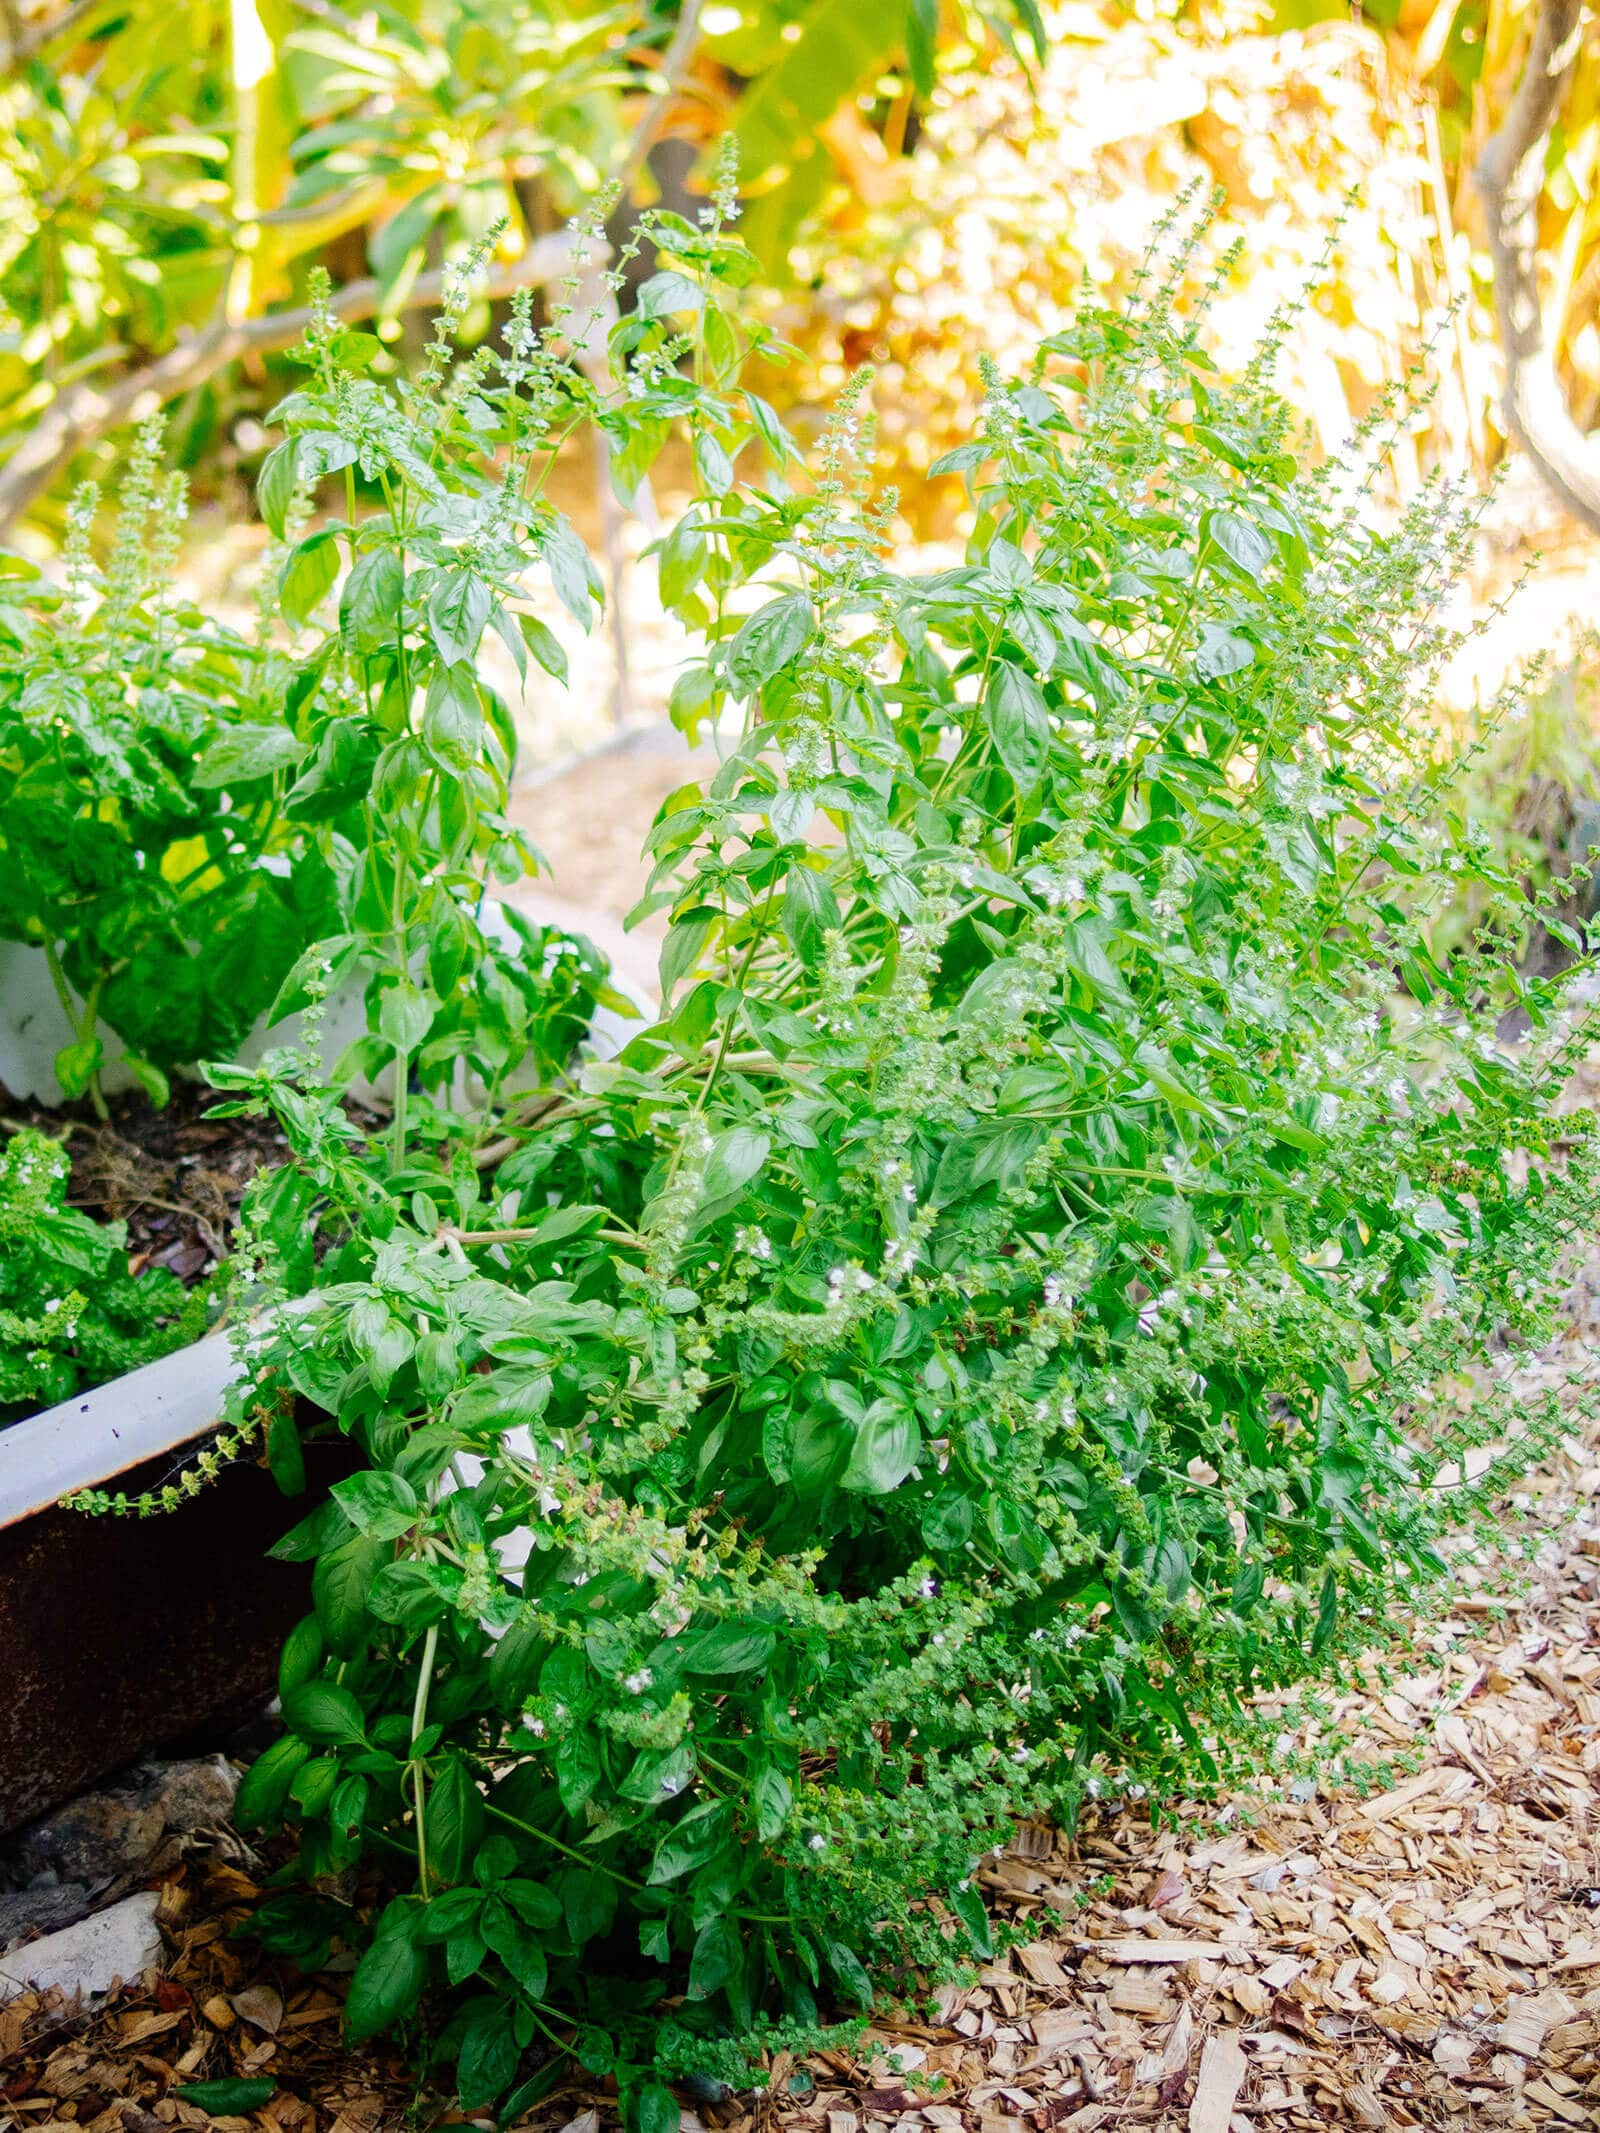 Overgrown Genovese basil plant in the garden